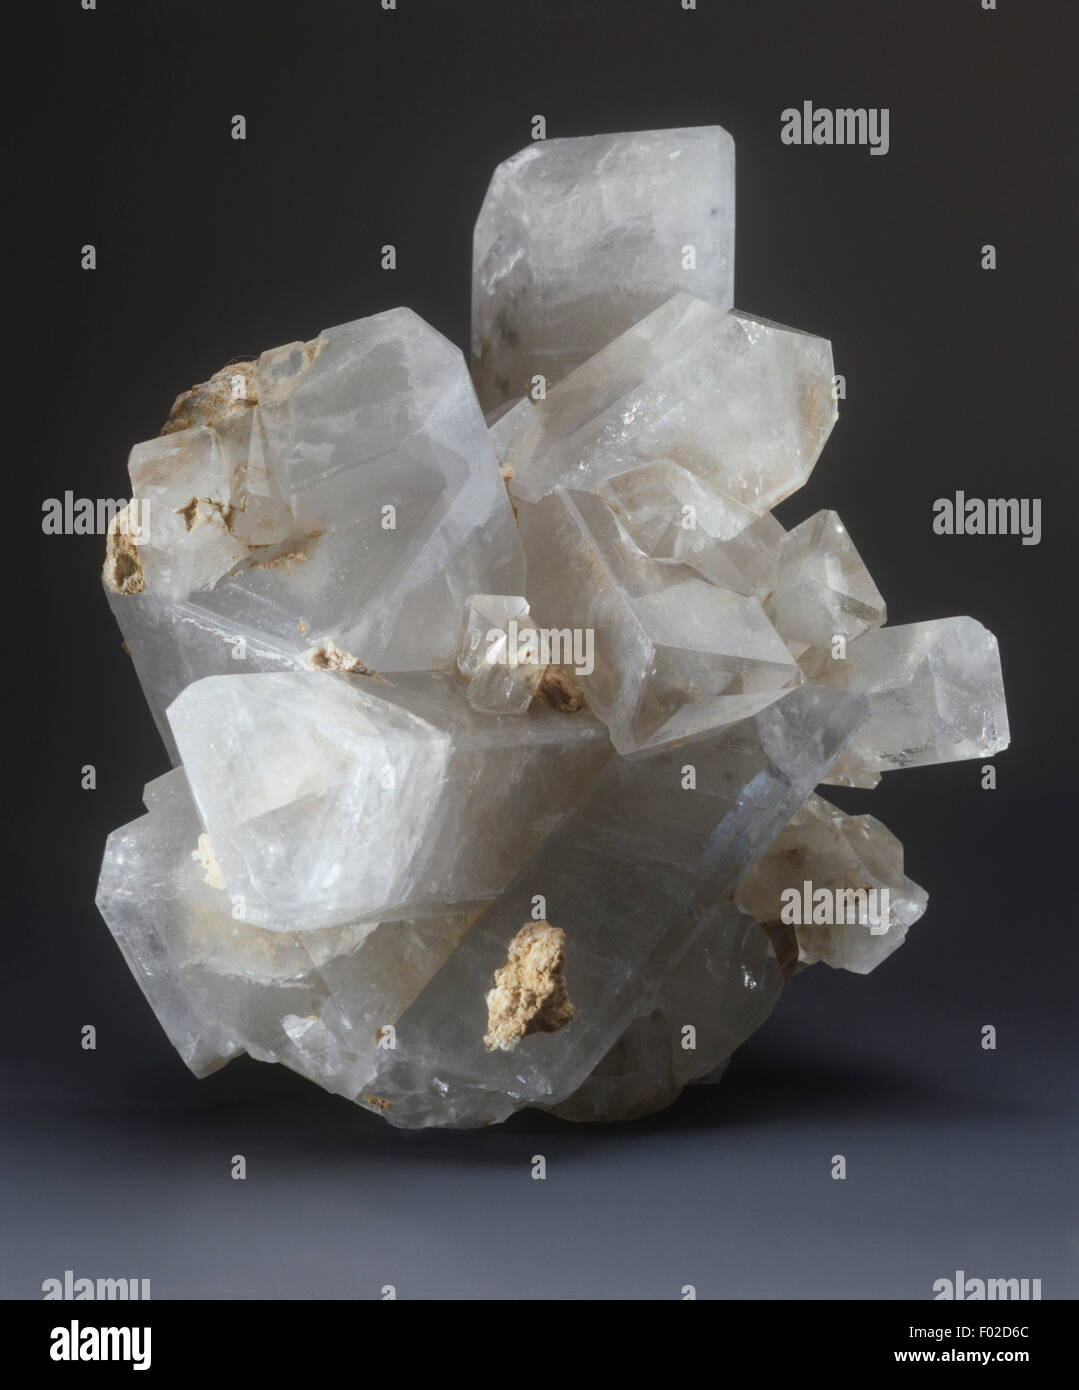 Celestine - Stock Image